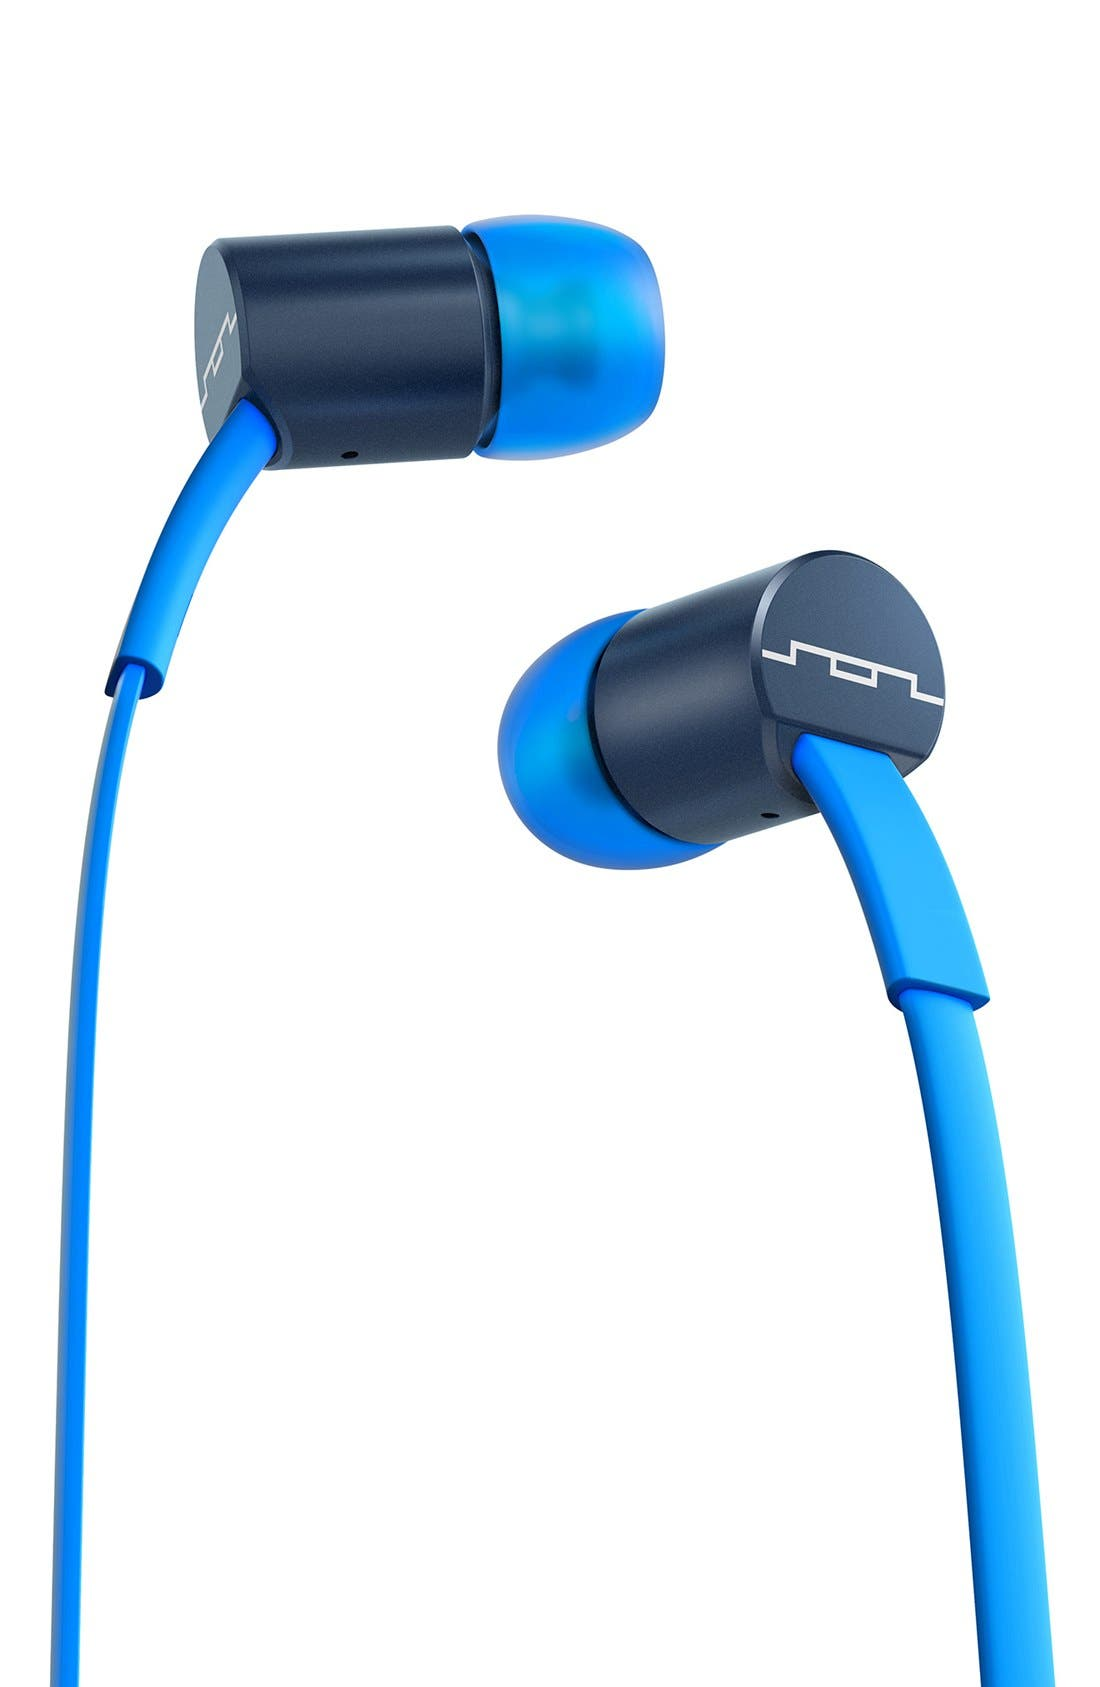 Alternate Image 1 Selected - SOL REPUBLIC 'Jax' In-Ear Headphones